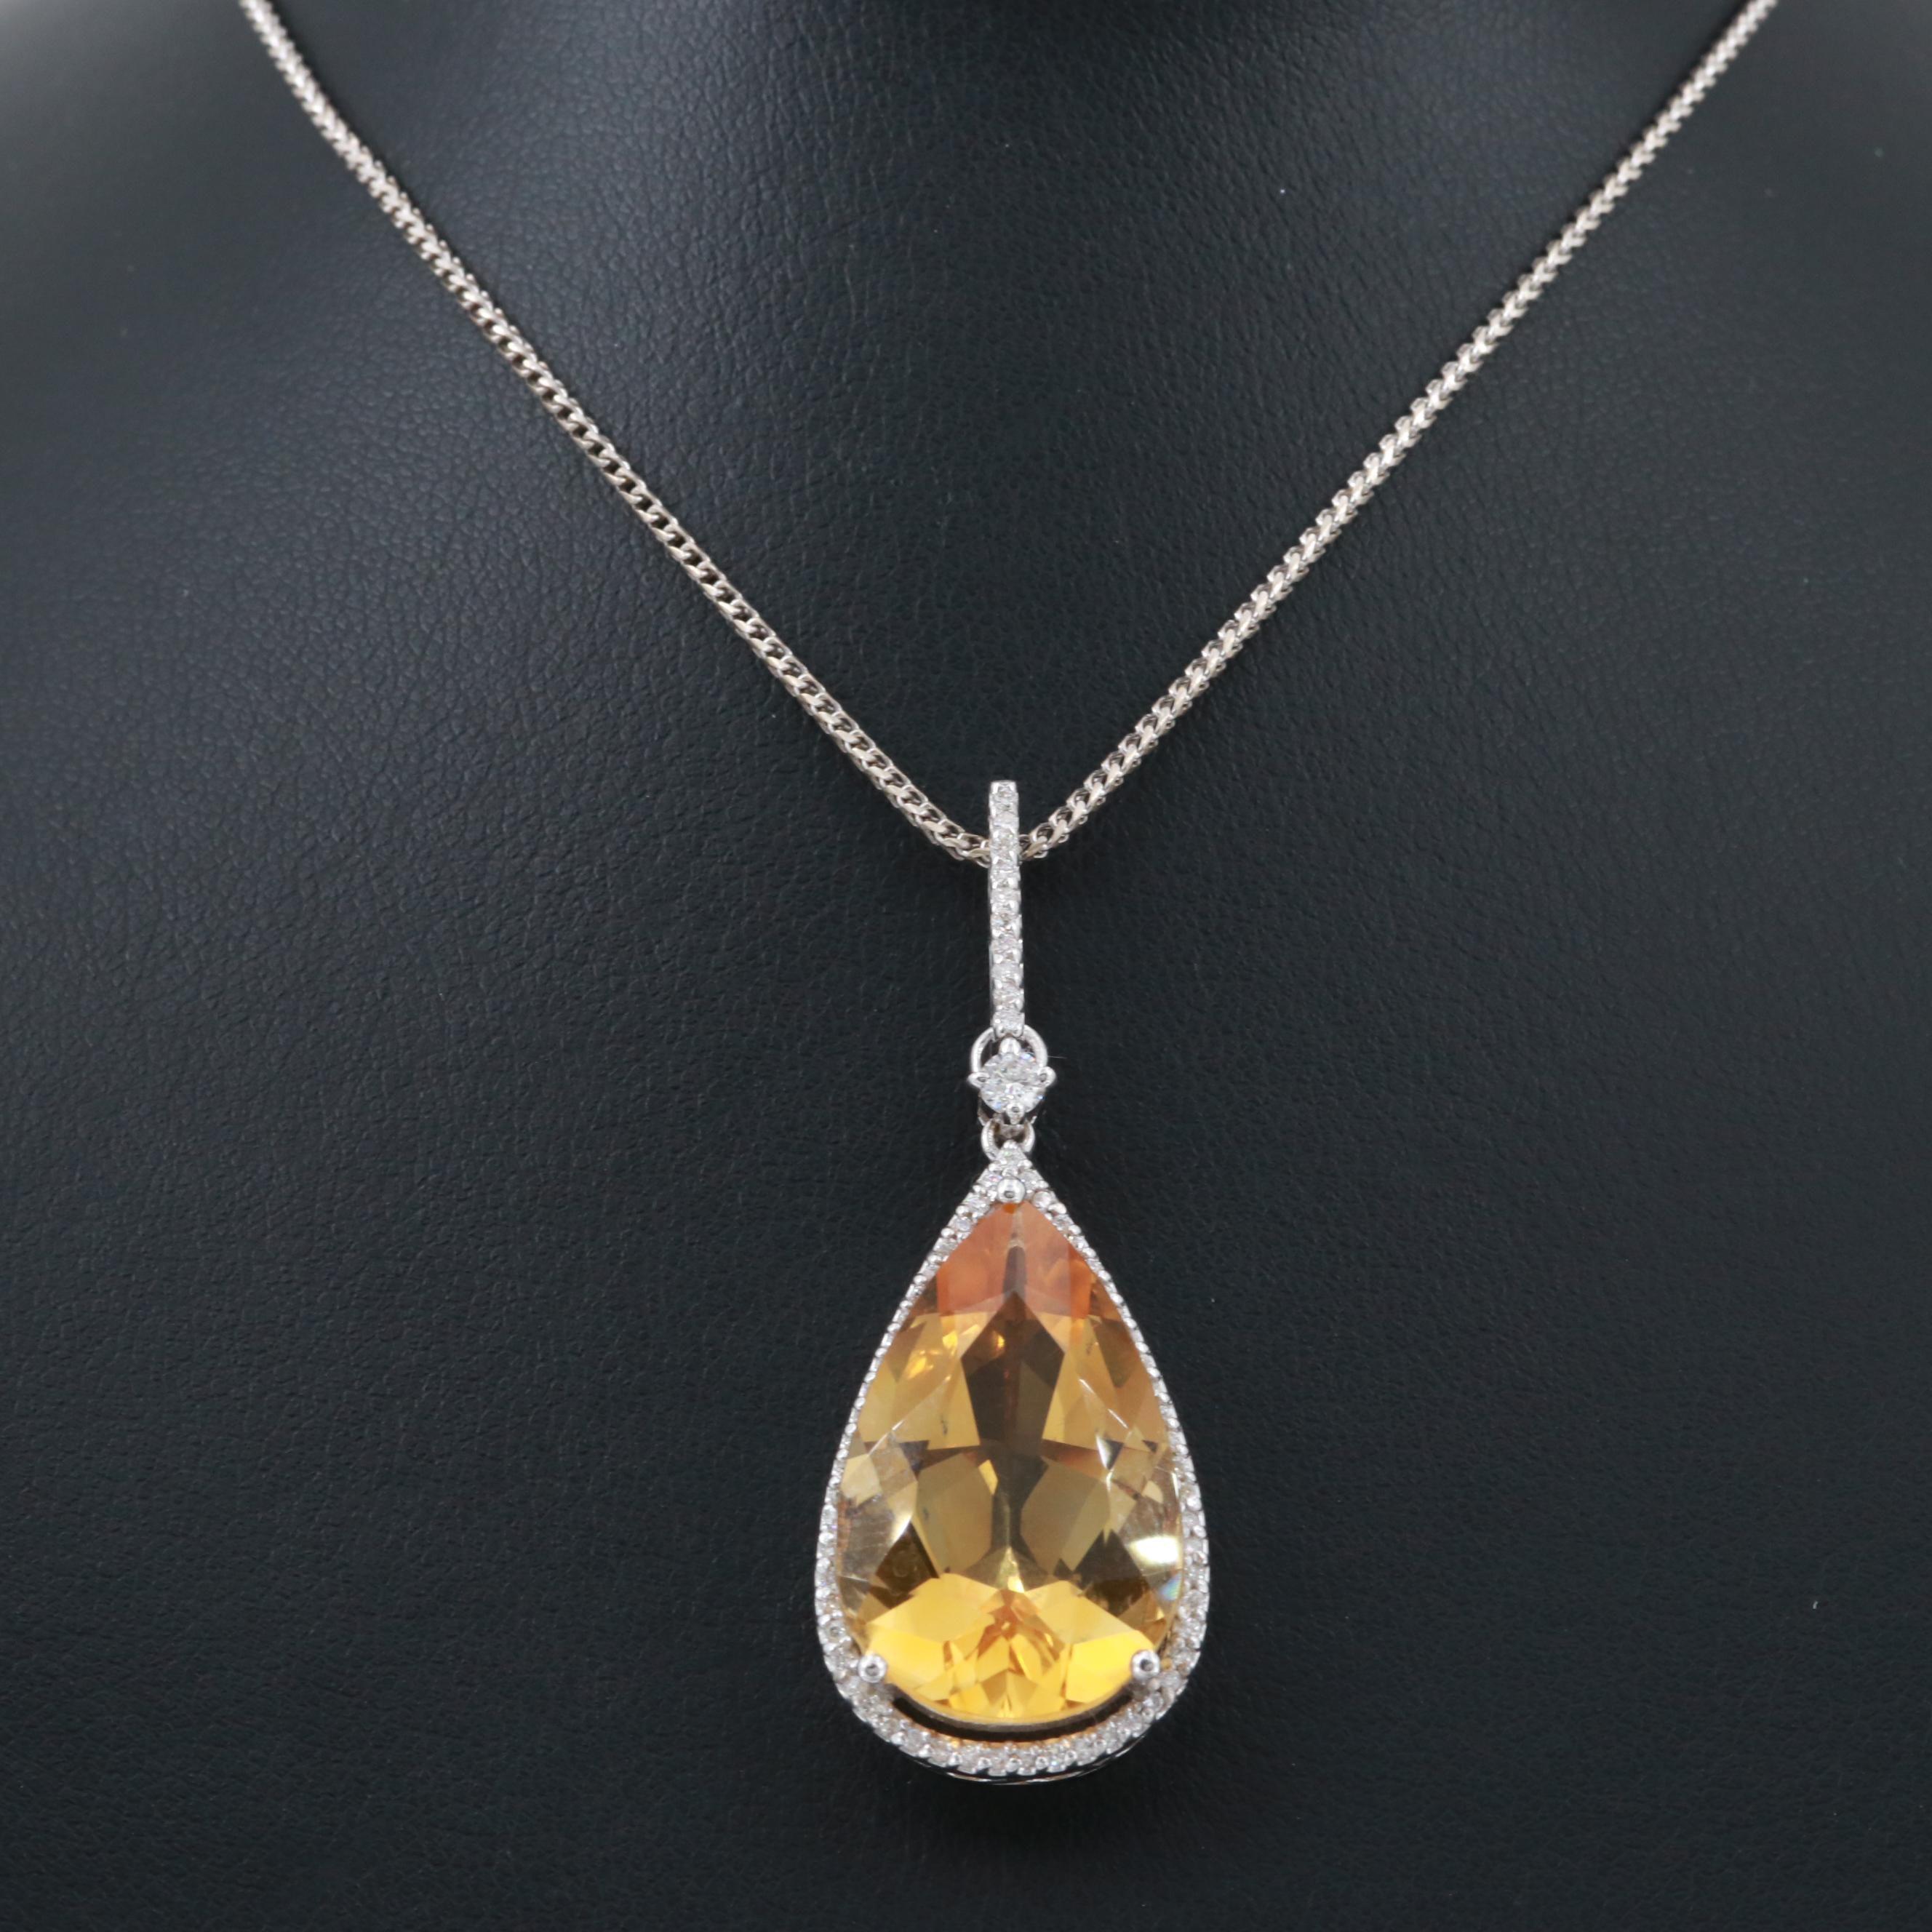 18K White Gold 11.82 CT Citrine and Diamond Pendant Necklace